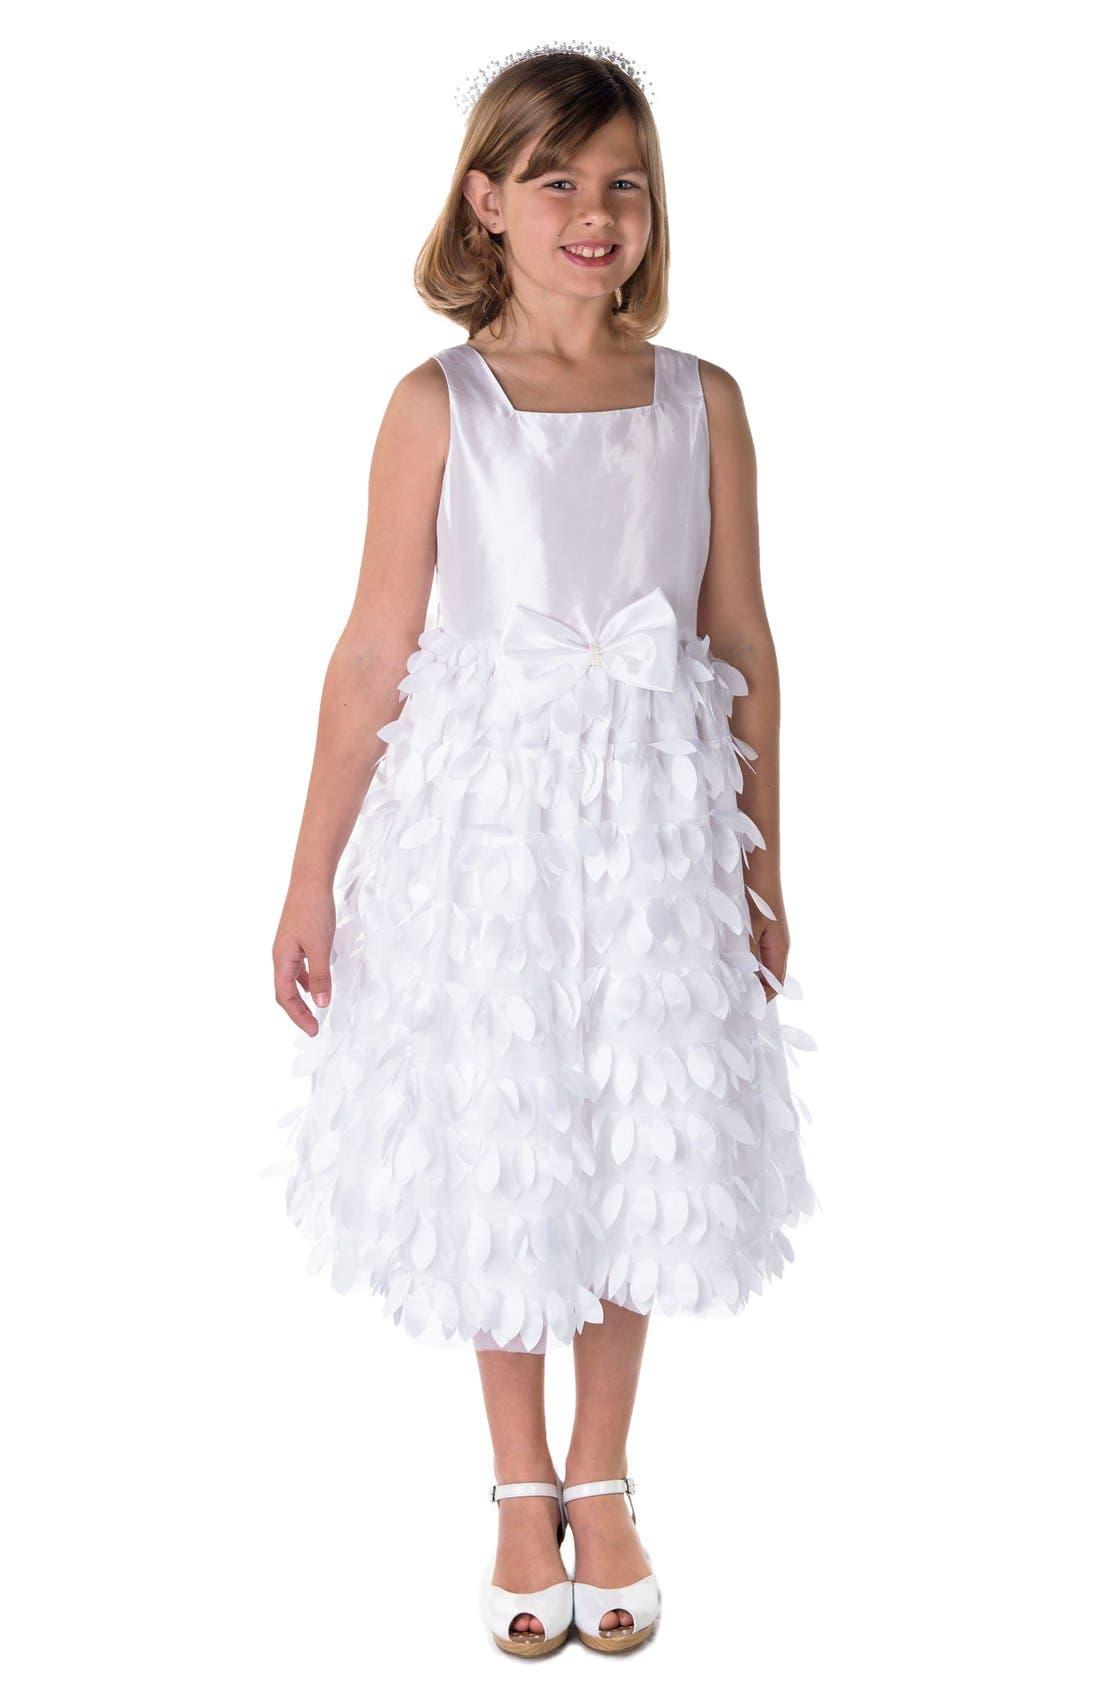 'Petal' Taffeta Flower Girl Dress,                             Main thumbnail 1, color,                             100